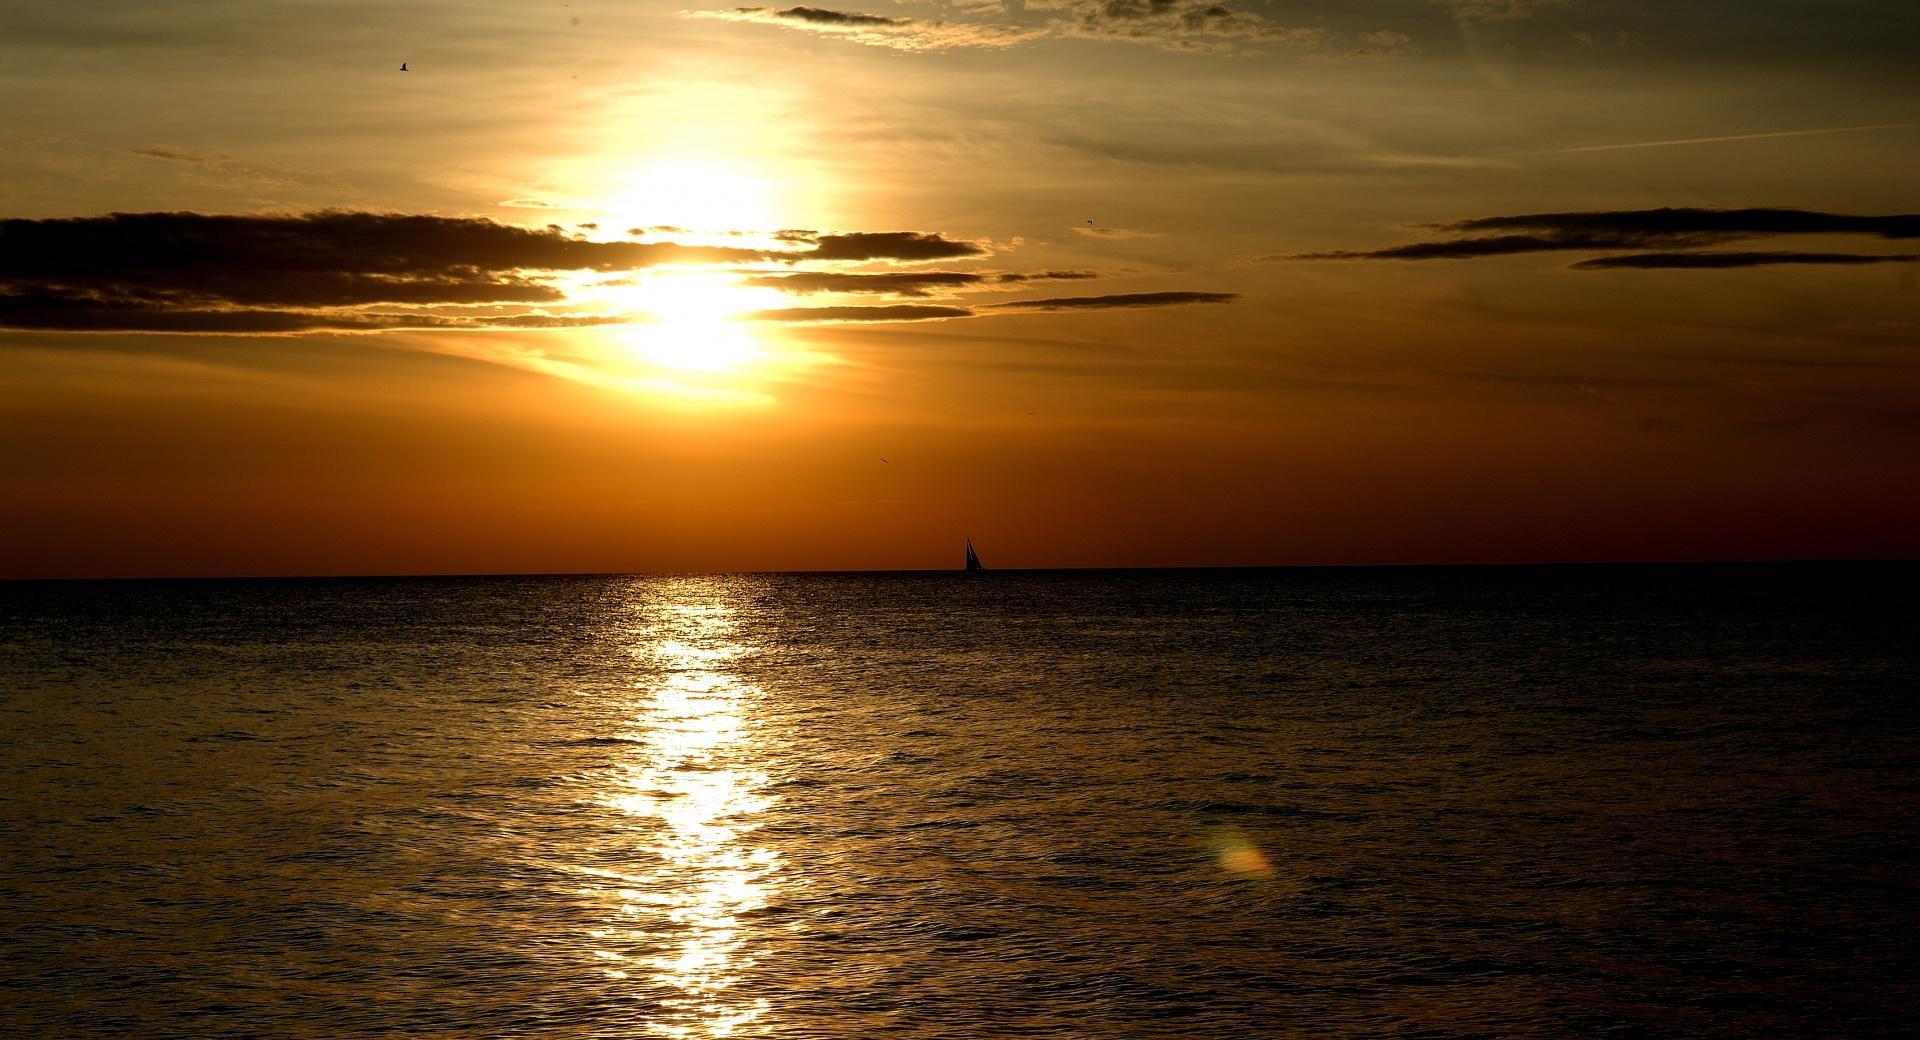 Golden Sunset, Summer wallpapers HD quality